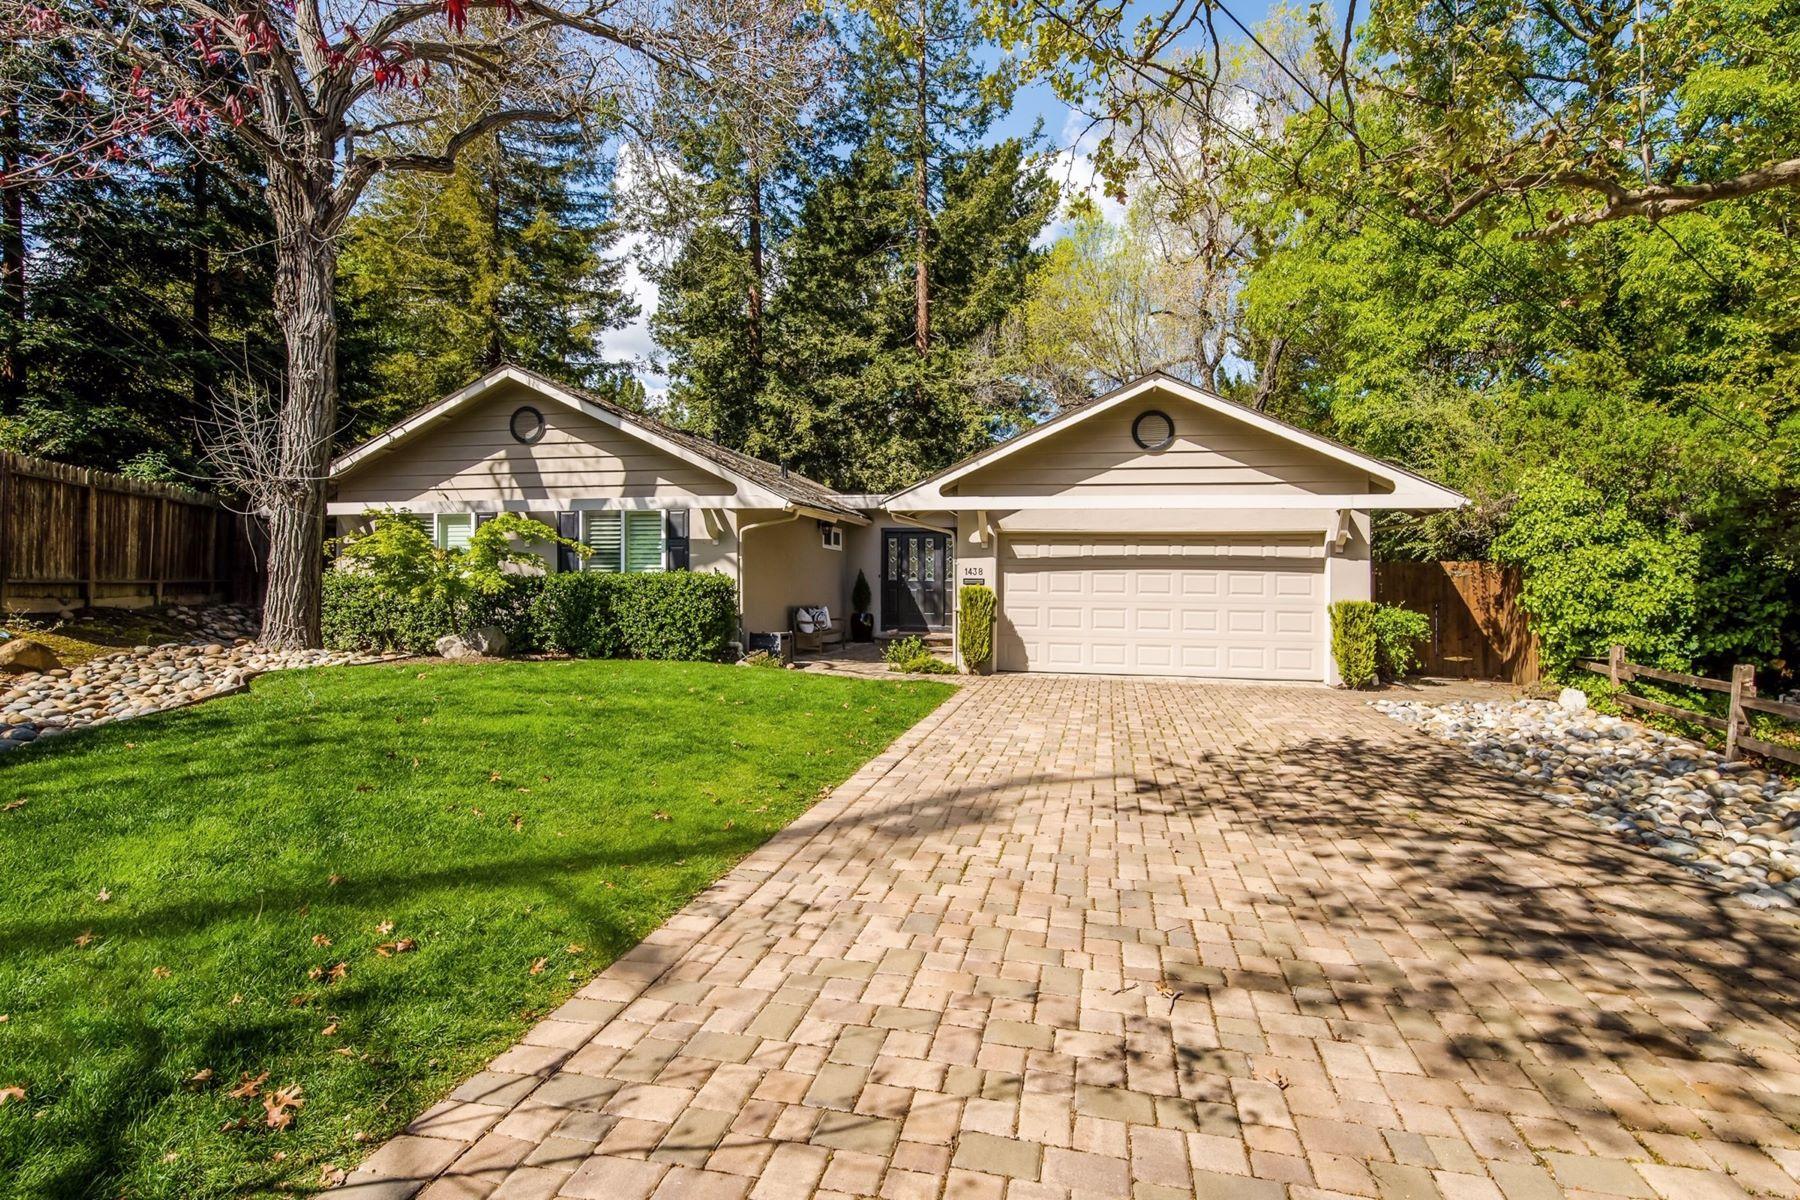 Single Family Homes for Active at Enchanted Setting Single Story 1438 Corona Place Walnut Creek, California 94597 United States